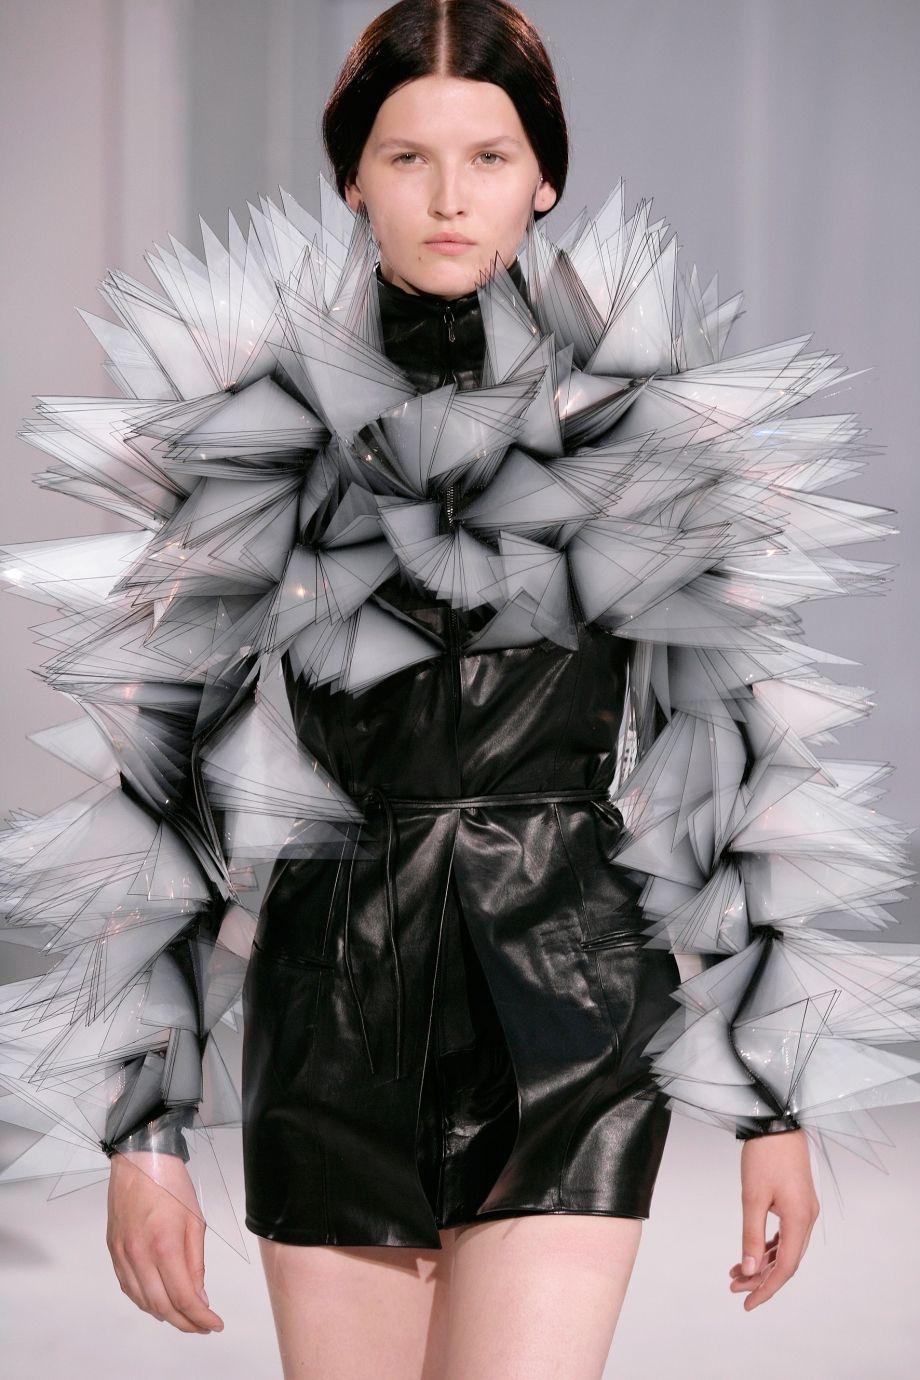 capriole [paris haute couture show] by Iris van Herpen from www.irisvanherpen.com